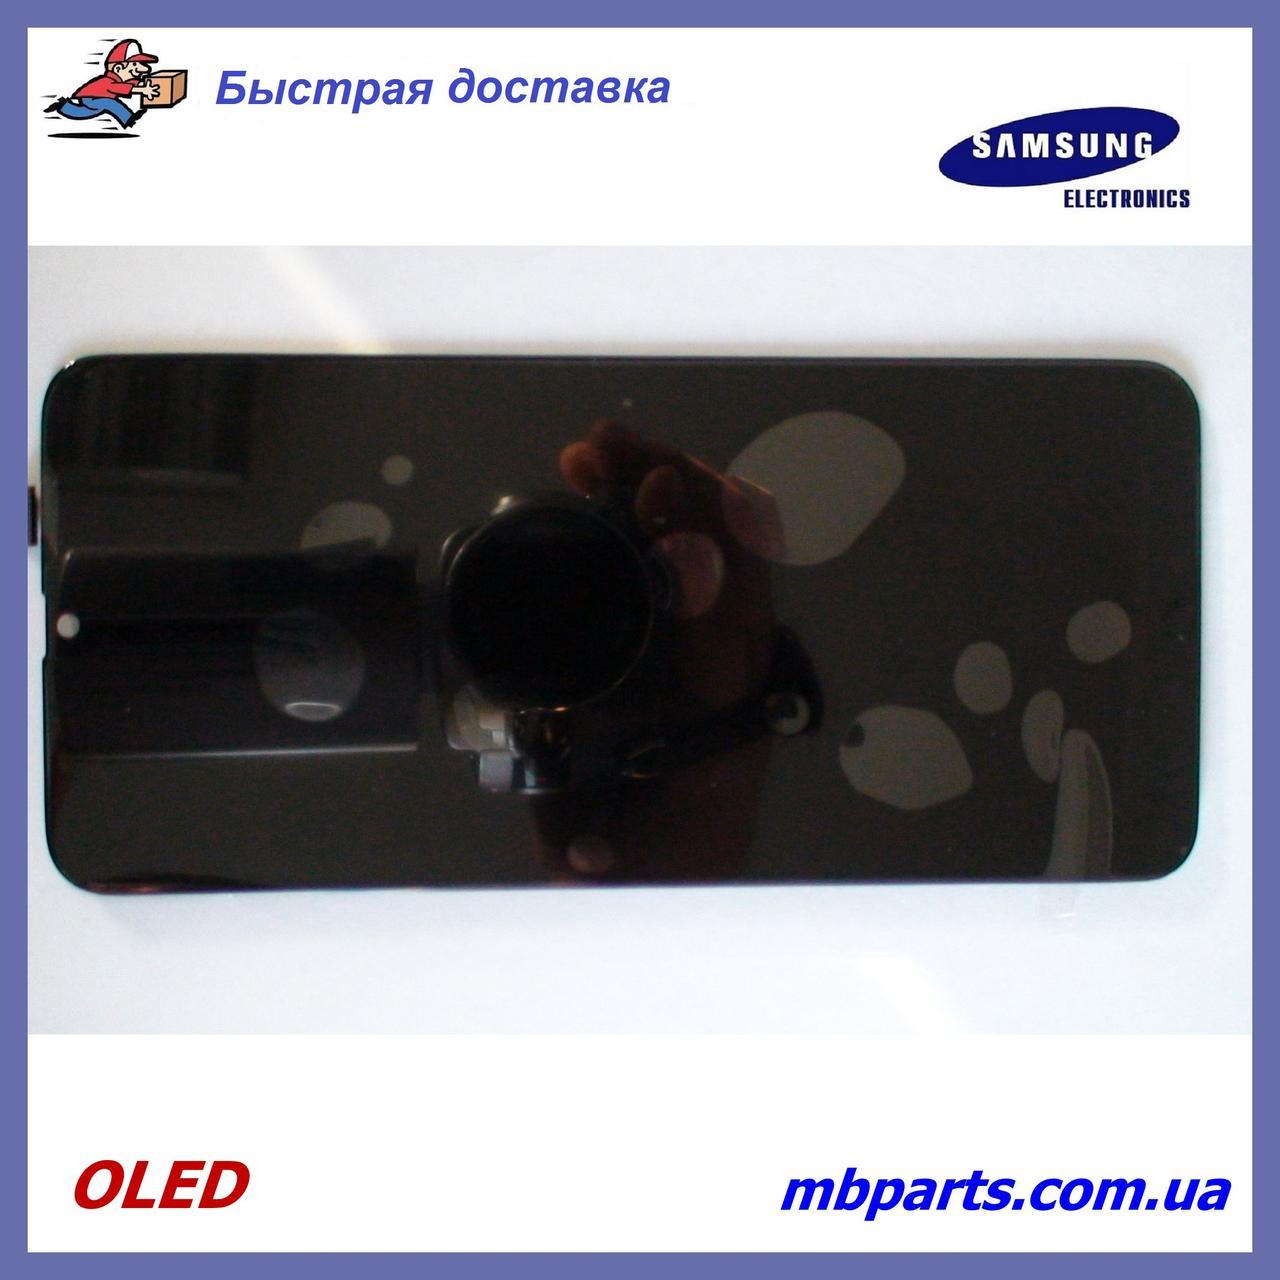 Дисплей с сенсором Samsung A505 Galaxy A50 2019 OLED, Black!